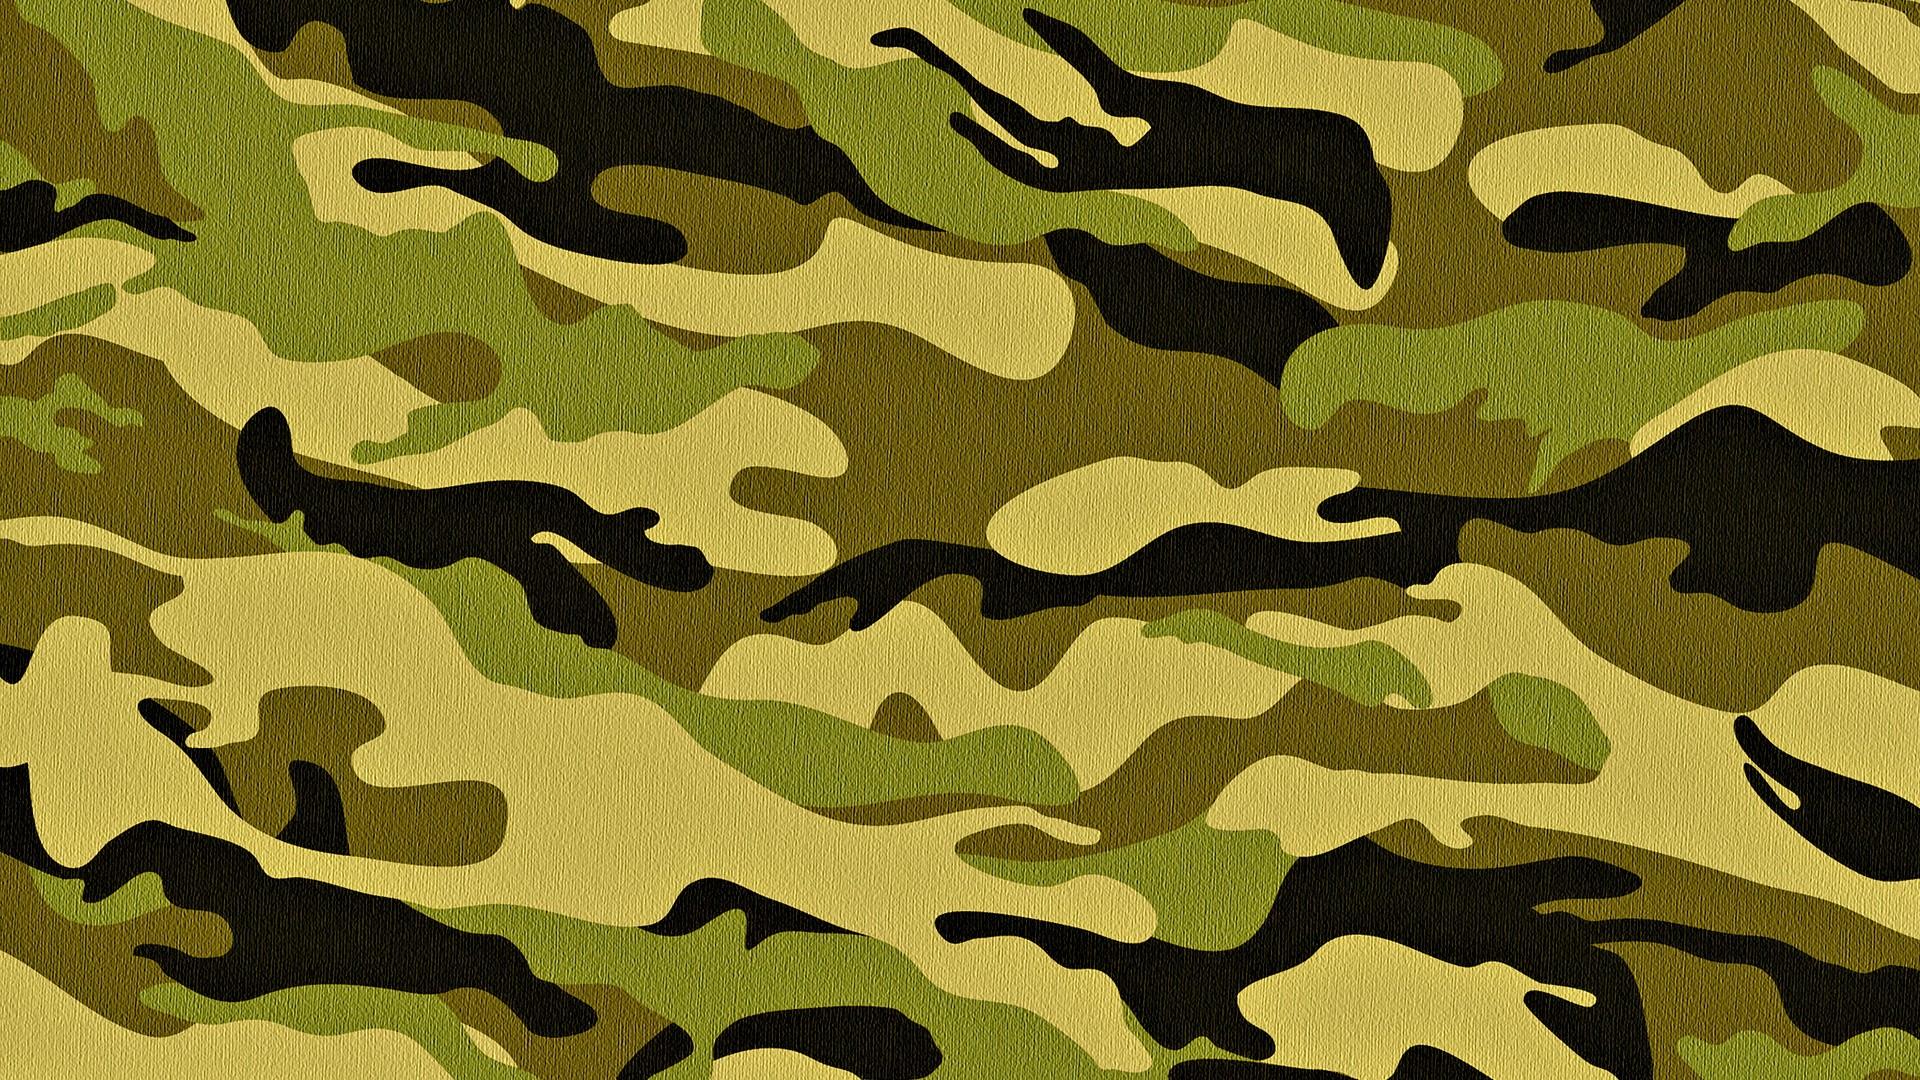 Camouflage Wallpaper 437 HD Screensavers Wallpaper